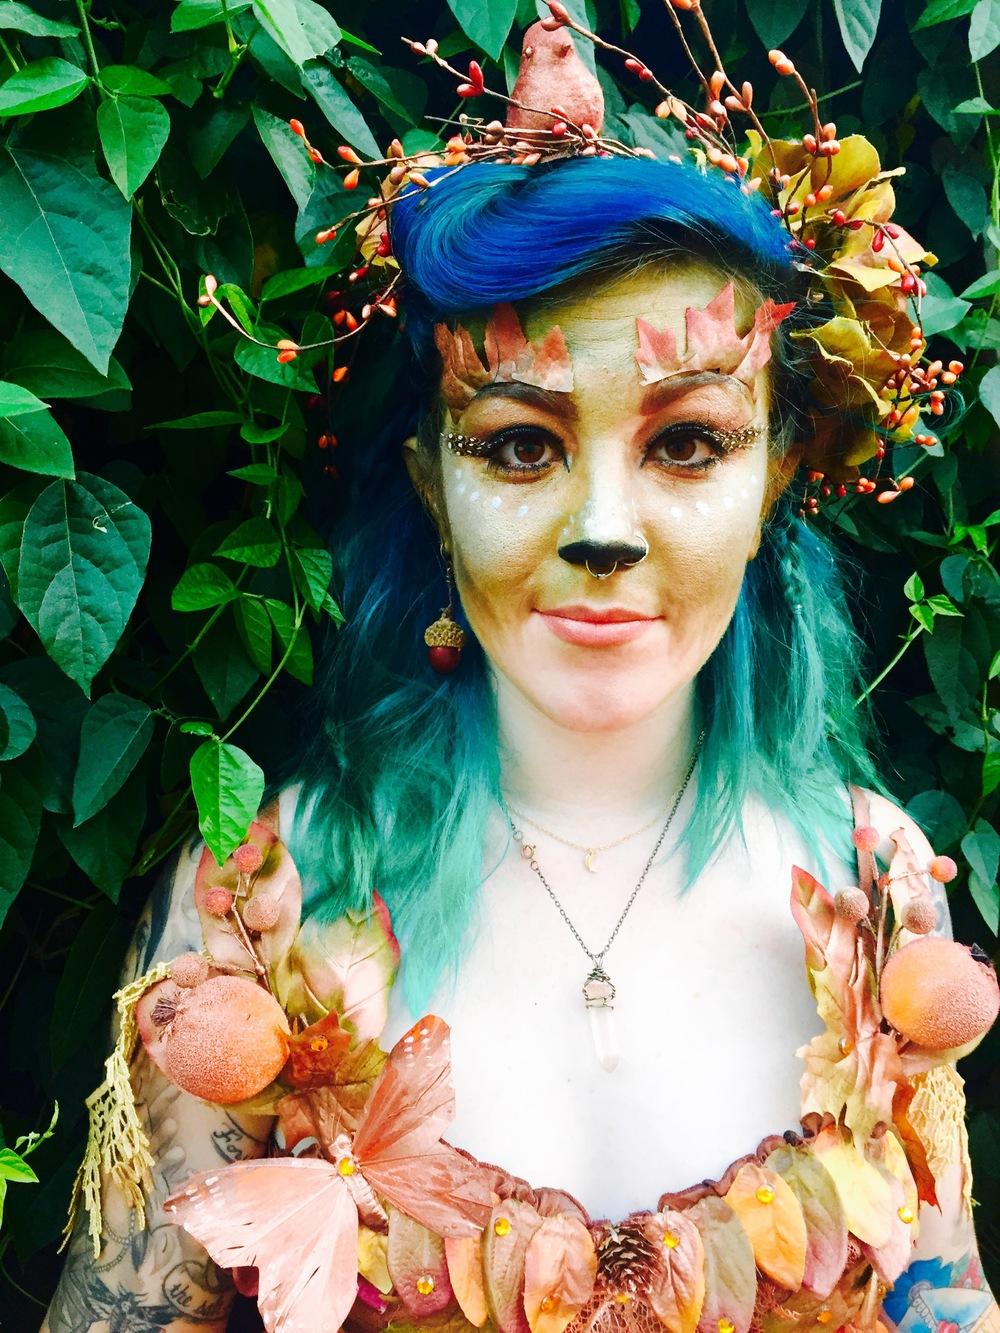 Labyrinth-of-jareth-woodland-elf-fairy-makeup